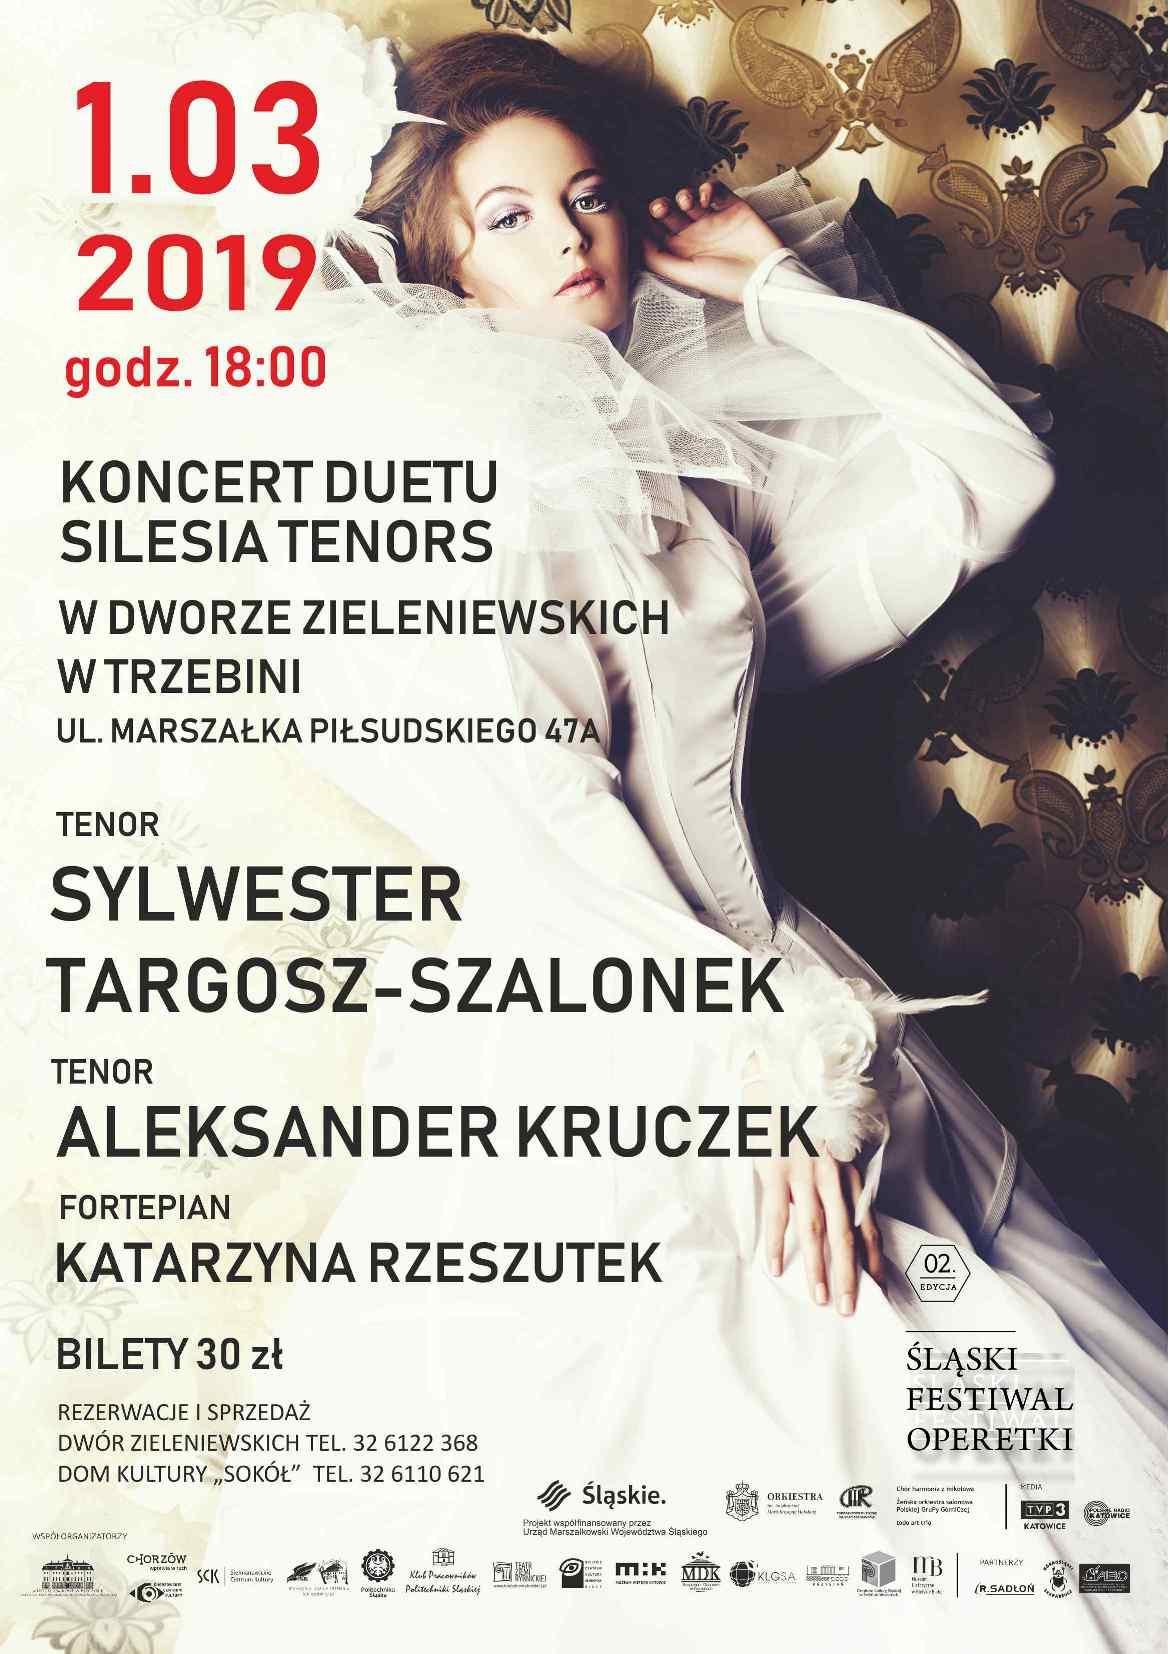 Silesia Tenors - koncert dwóch tenorów